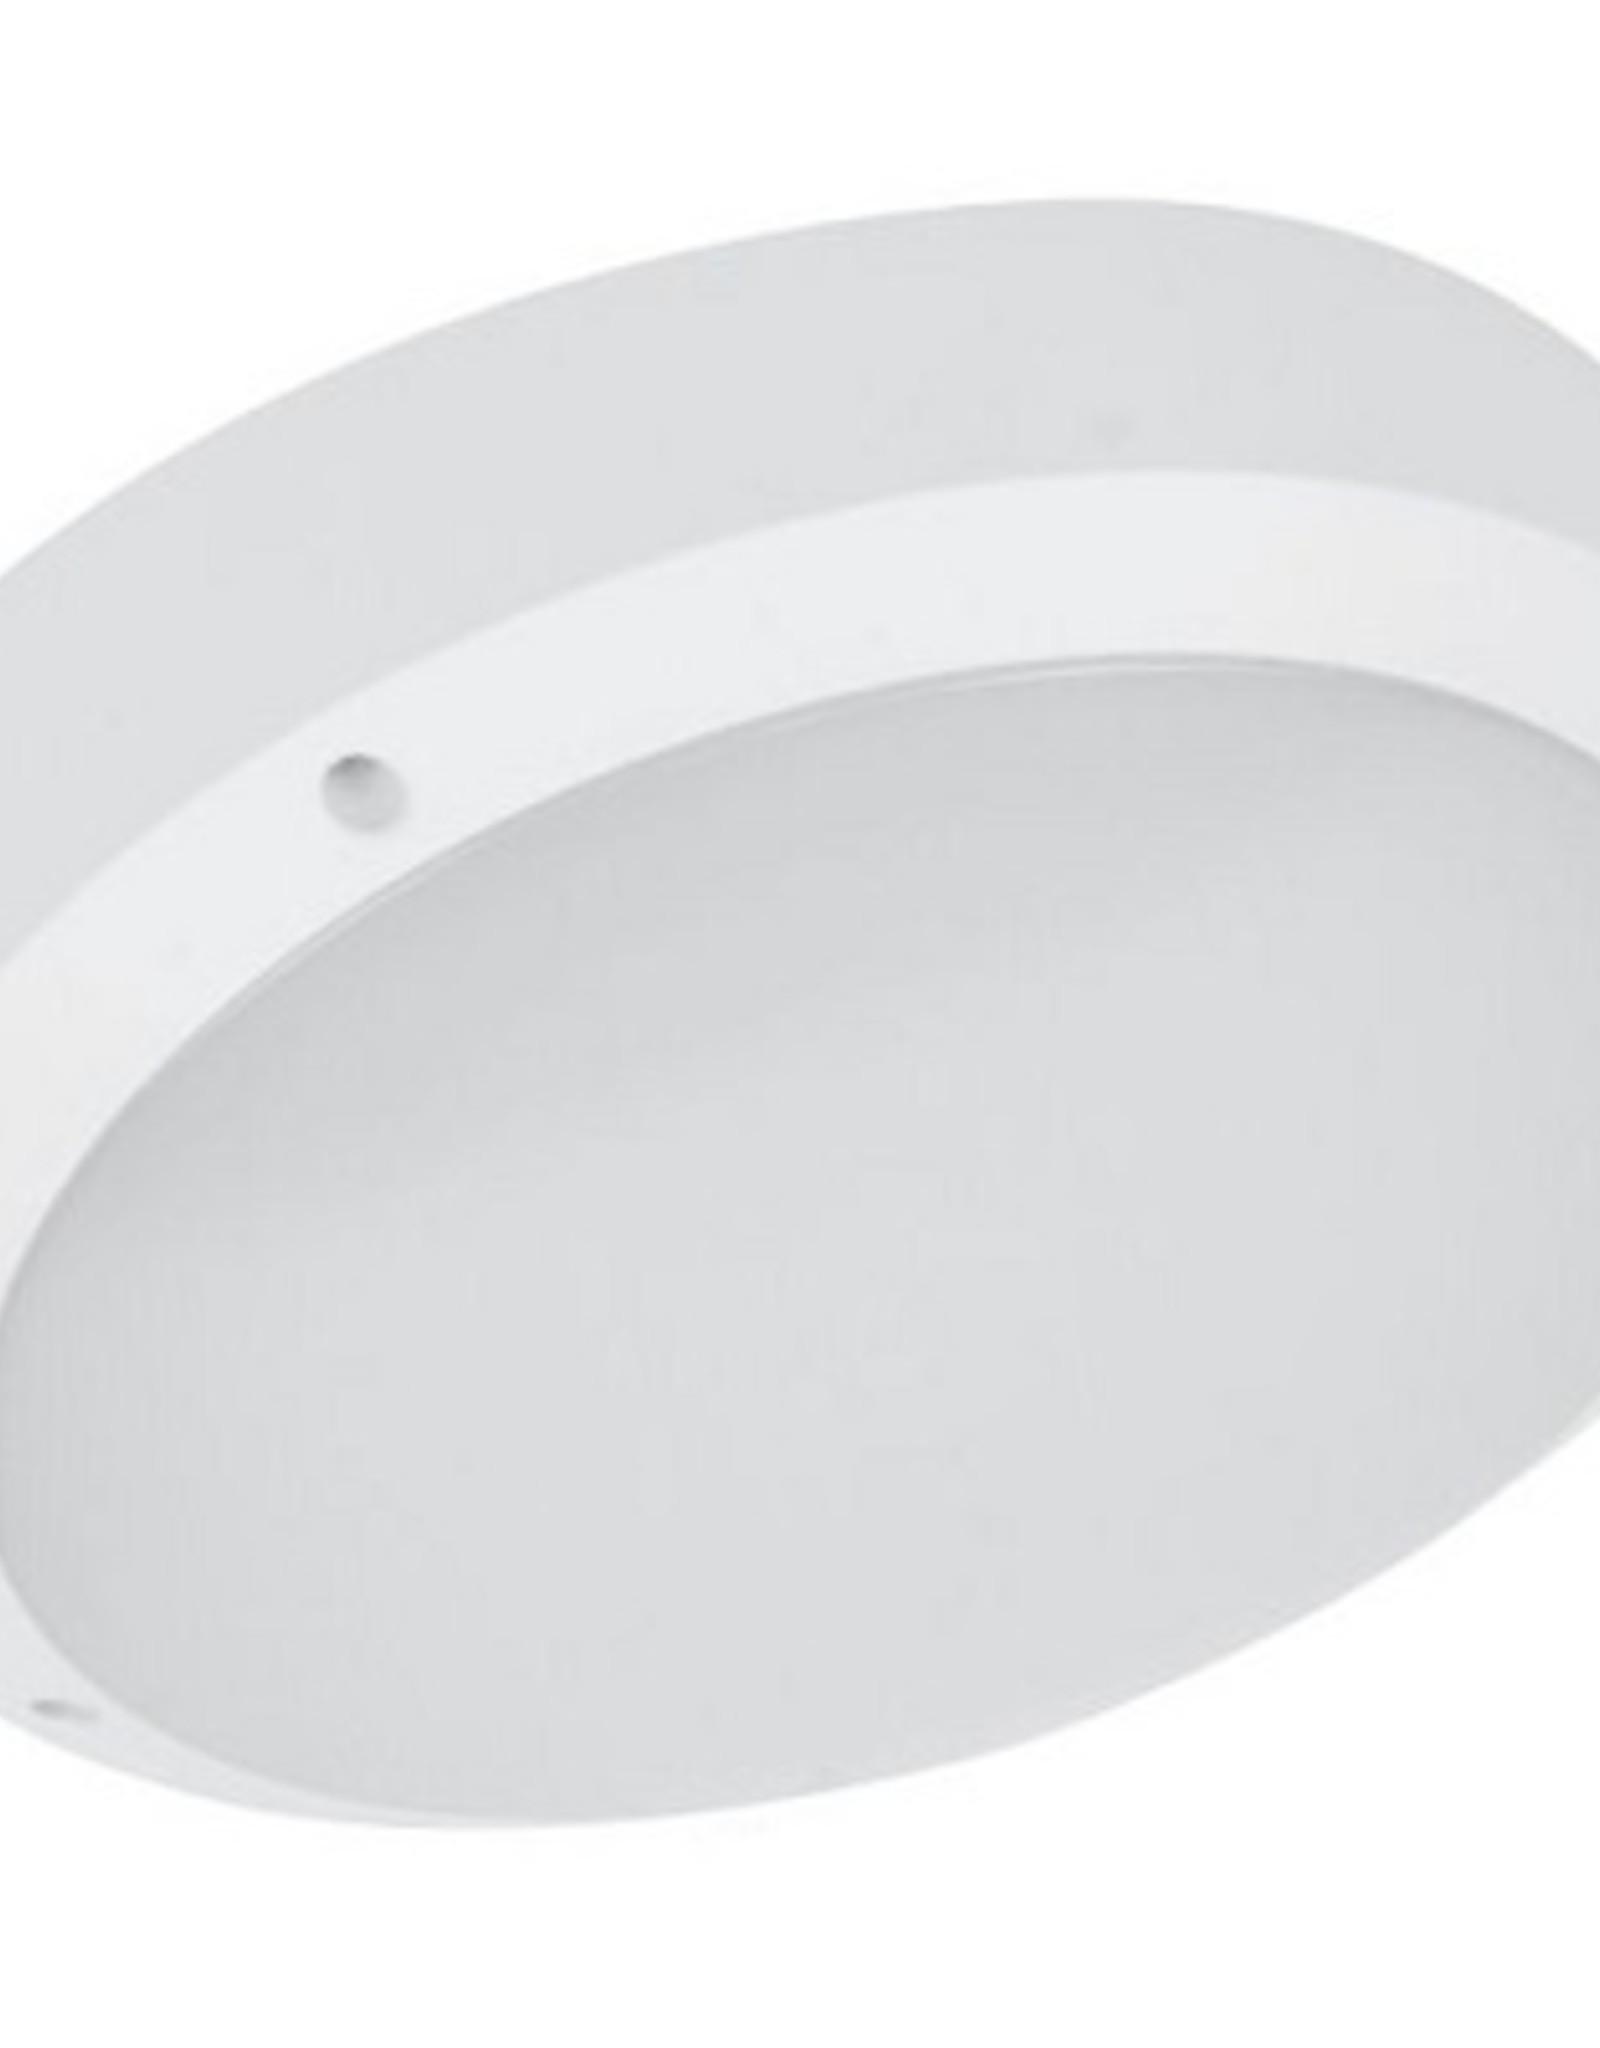 LedLed LED Plafonniere IK10 ROLO 18W 3000k